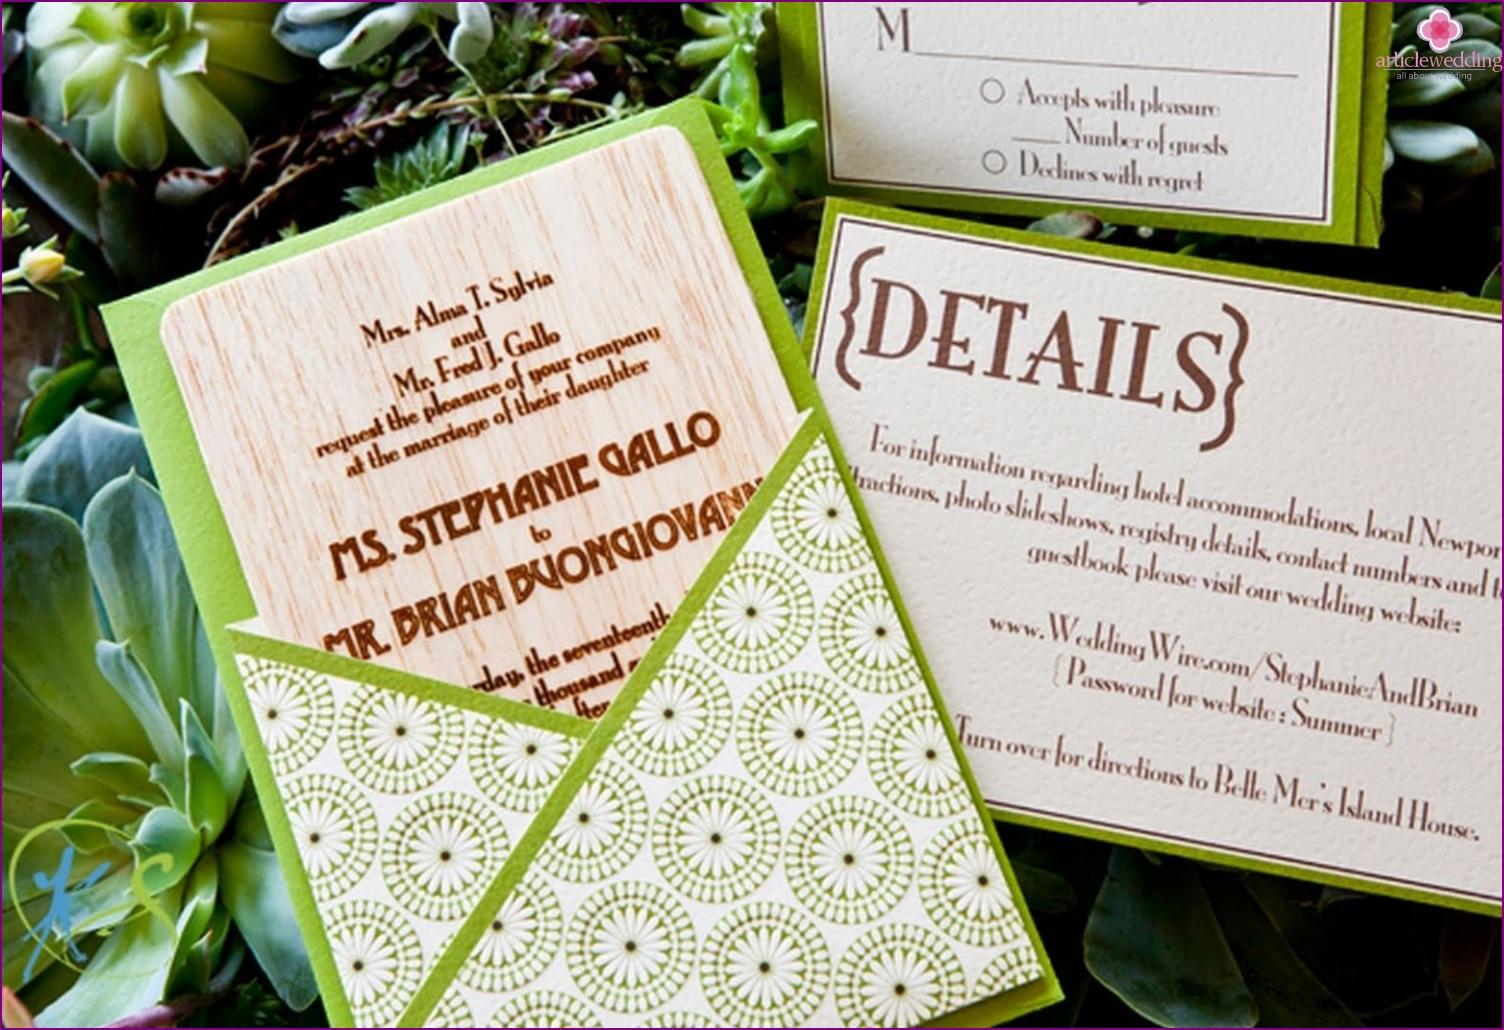 Invitations to eco-style